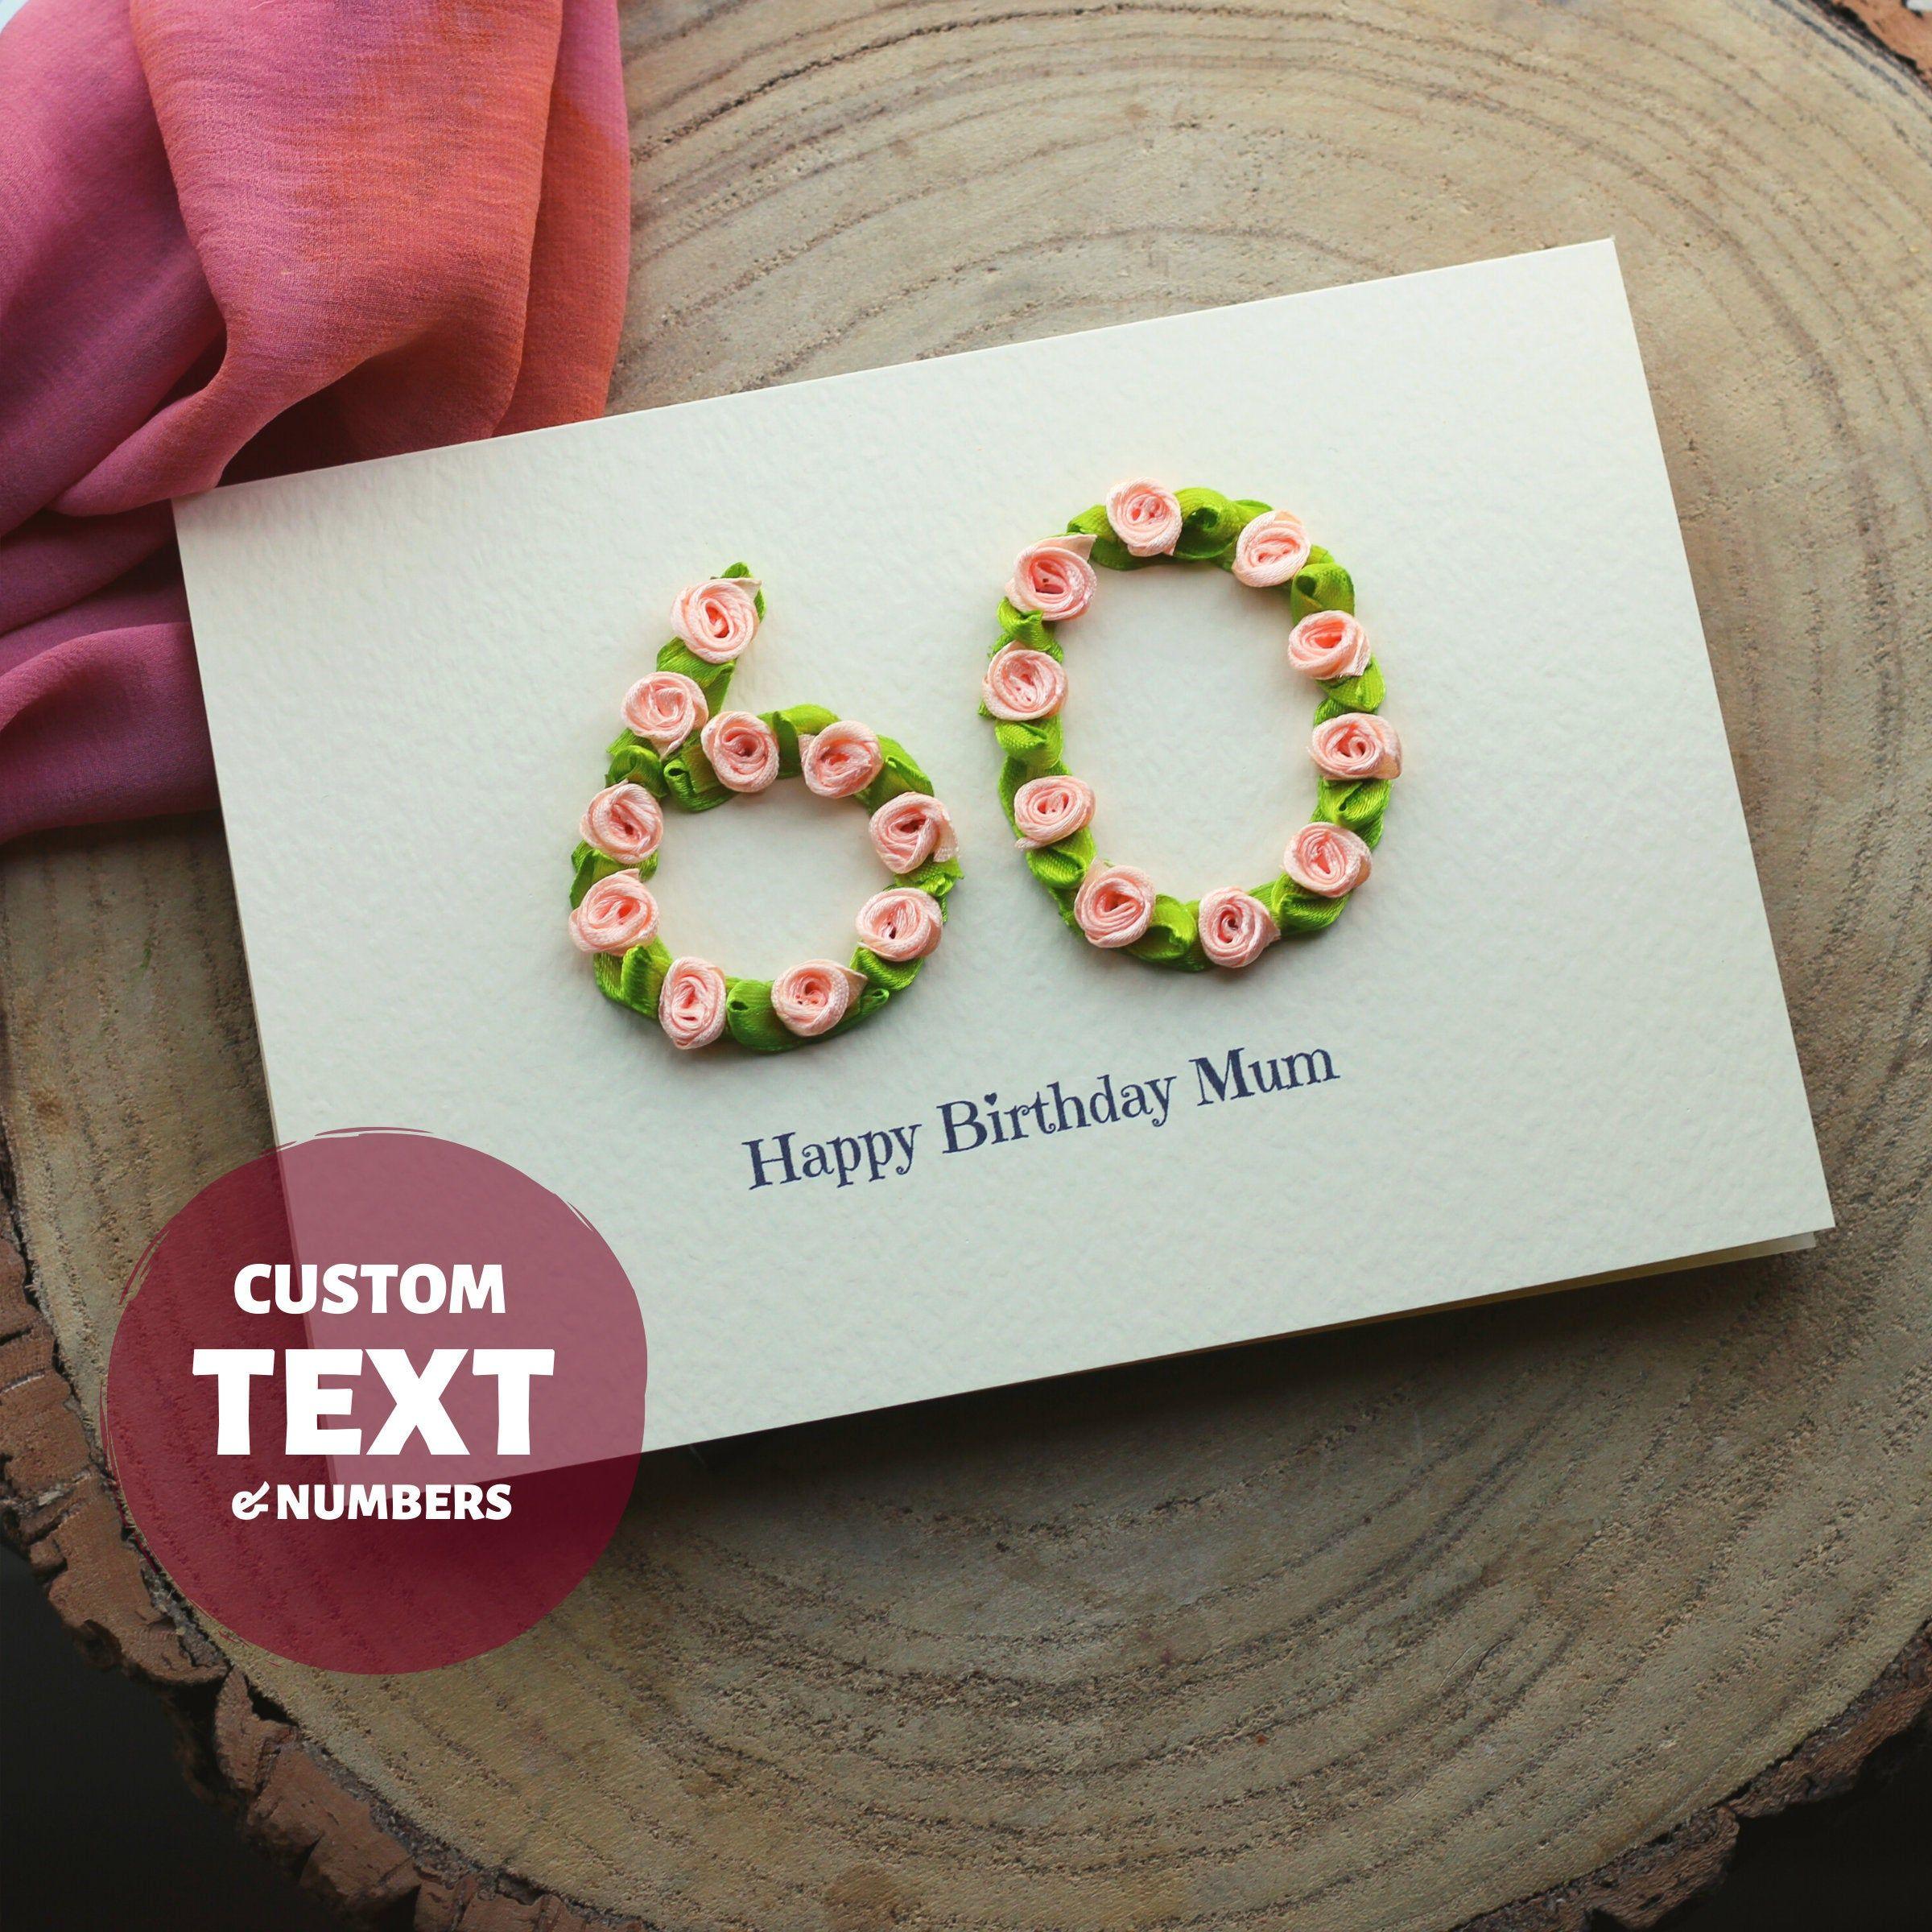 Luxury Birthday Card For Mum 60th Birthday Handmade Happy Etsy Luxury Birthday Cards Birthday Cards For Mum Happy 60th Birthday